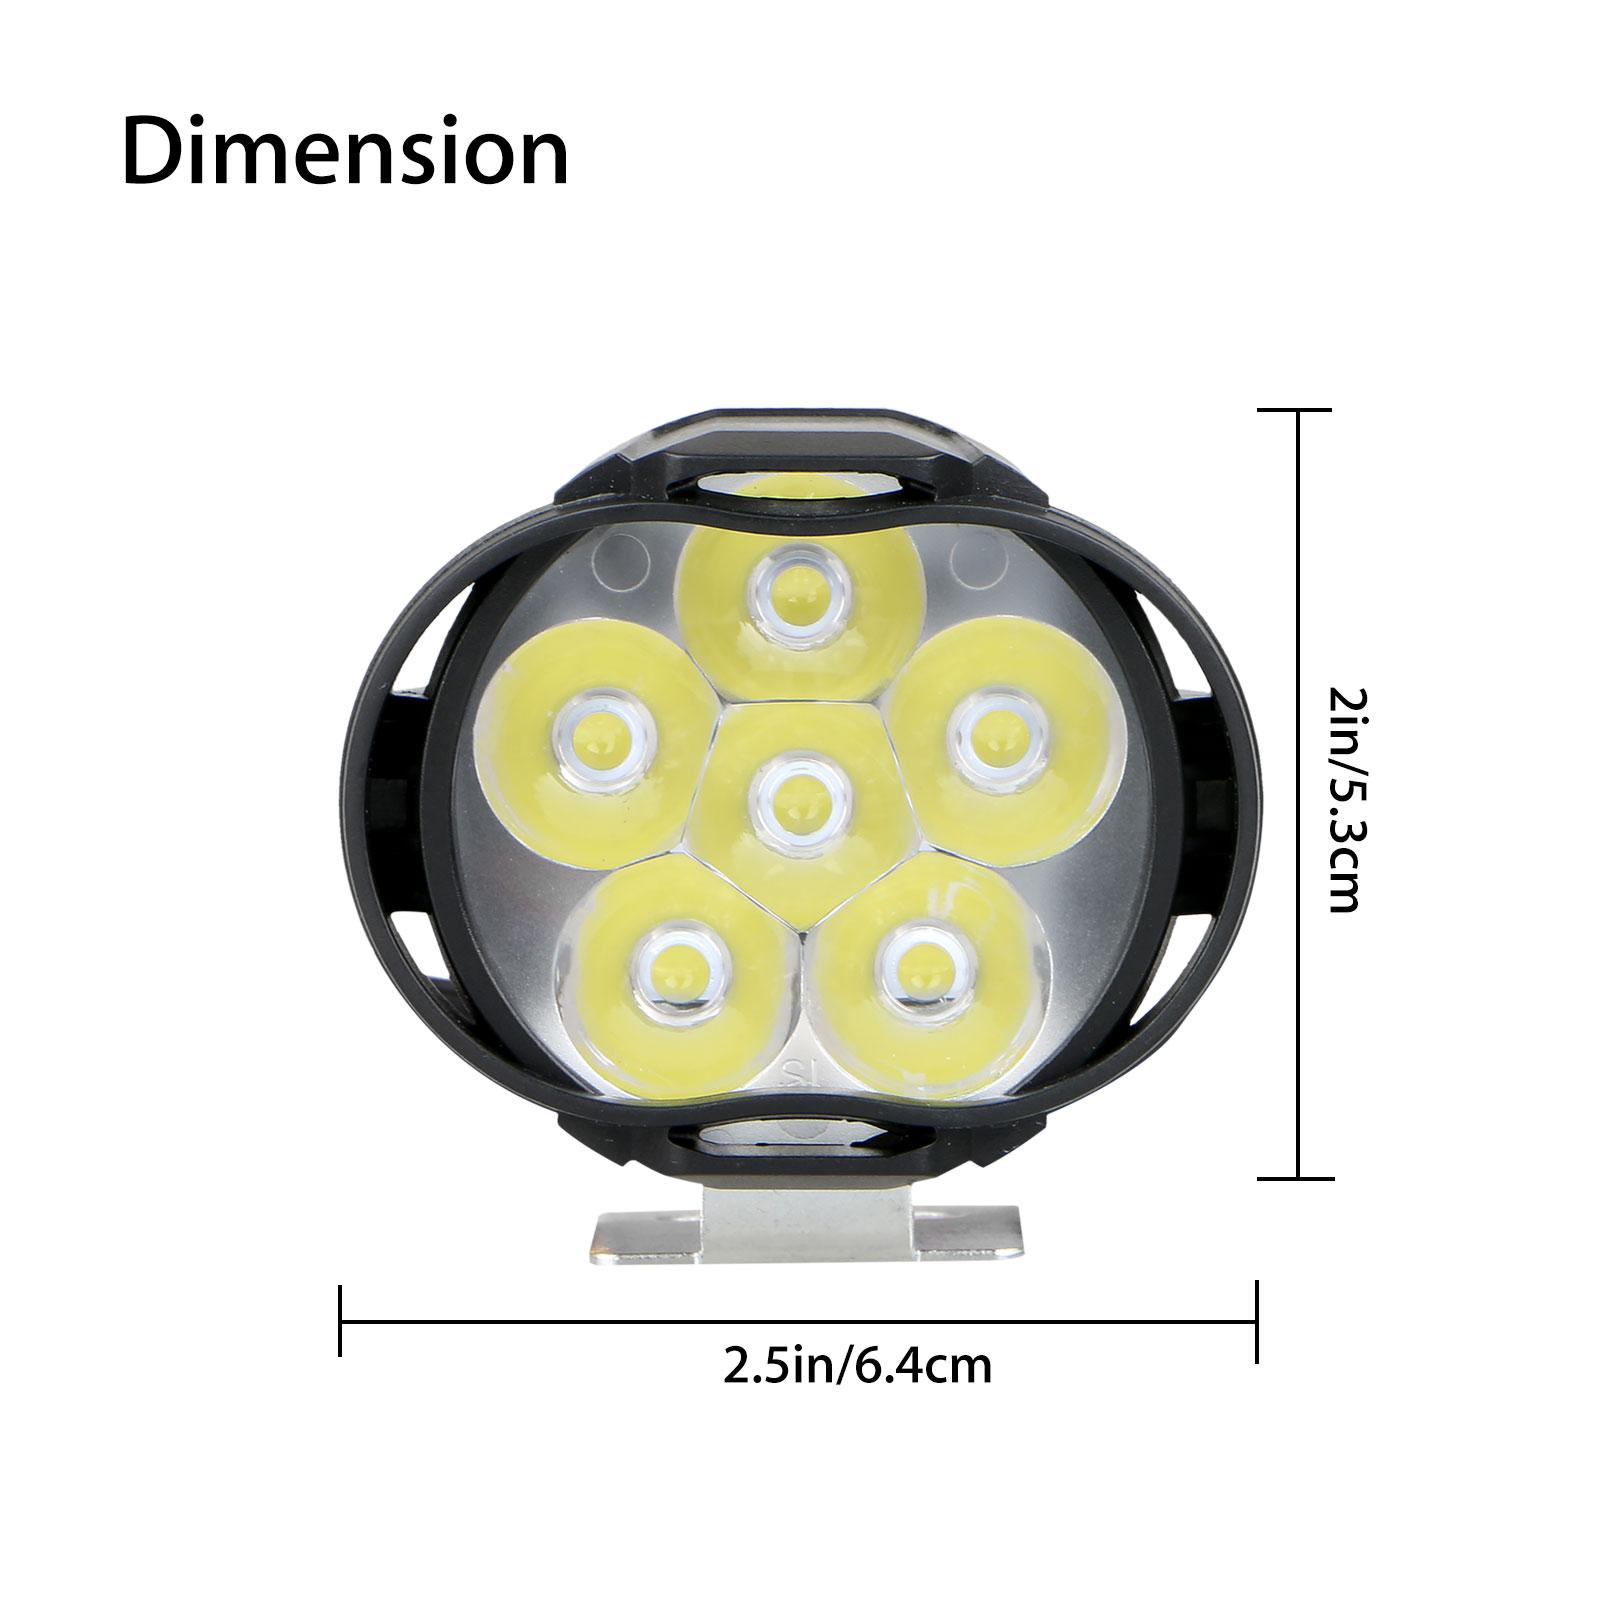 2Pcs-Universal-Car-SUV-Motorcycle-LED-Waterproof-Lights-Fog-Light-Headlight-Lamp thumbnail 7